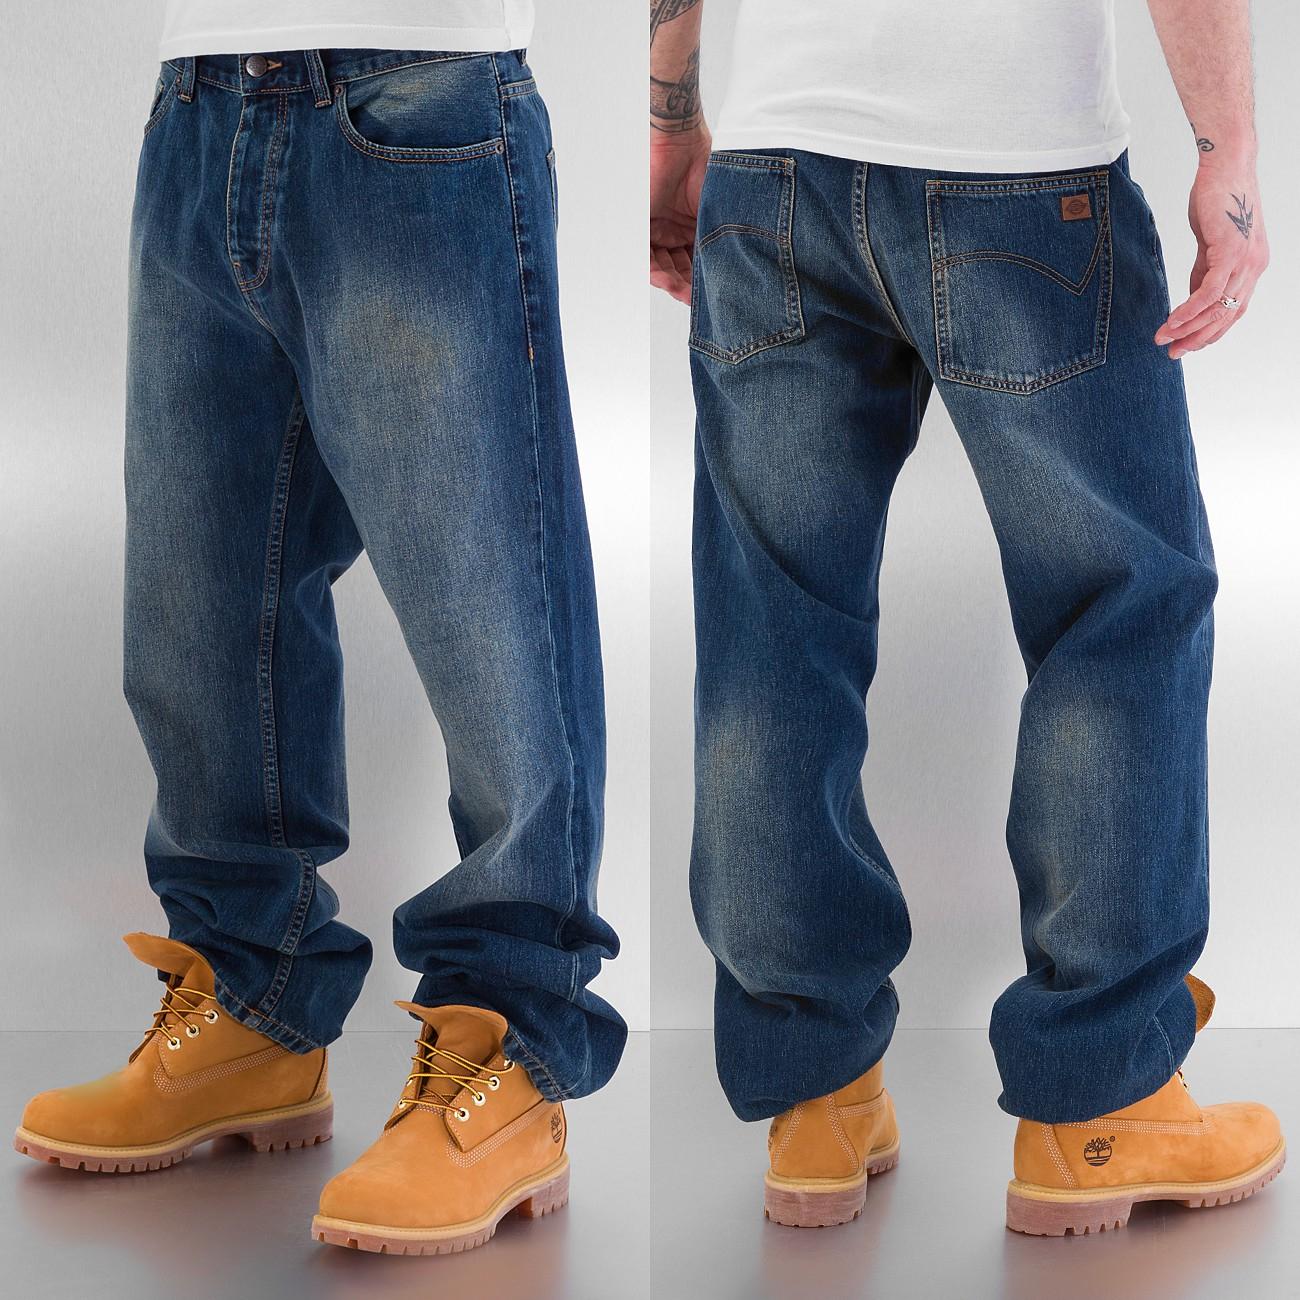 Jeans Sale - bis zu 33% bei [defshop]: z.B. Dickies, VSCT, Pascucci